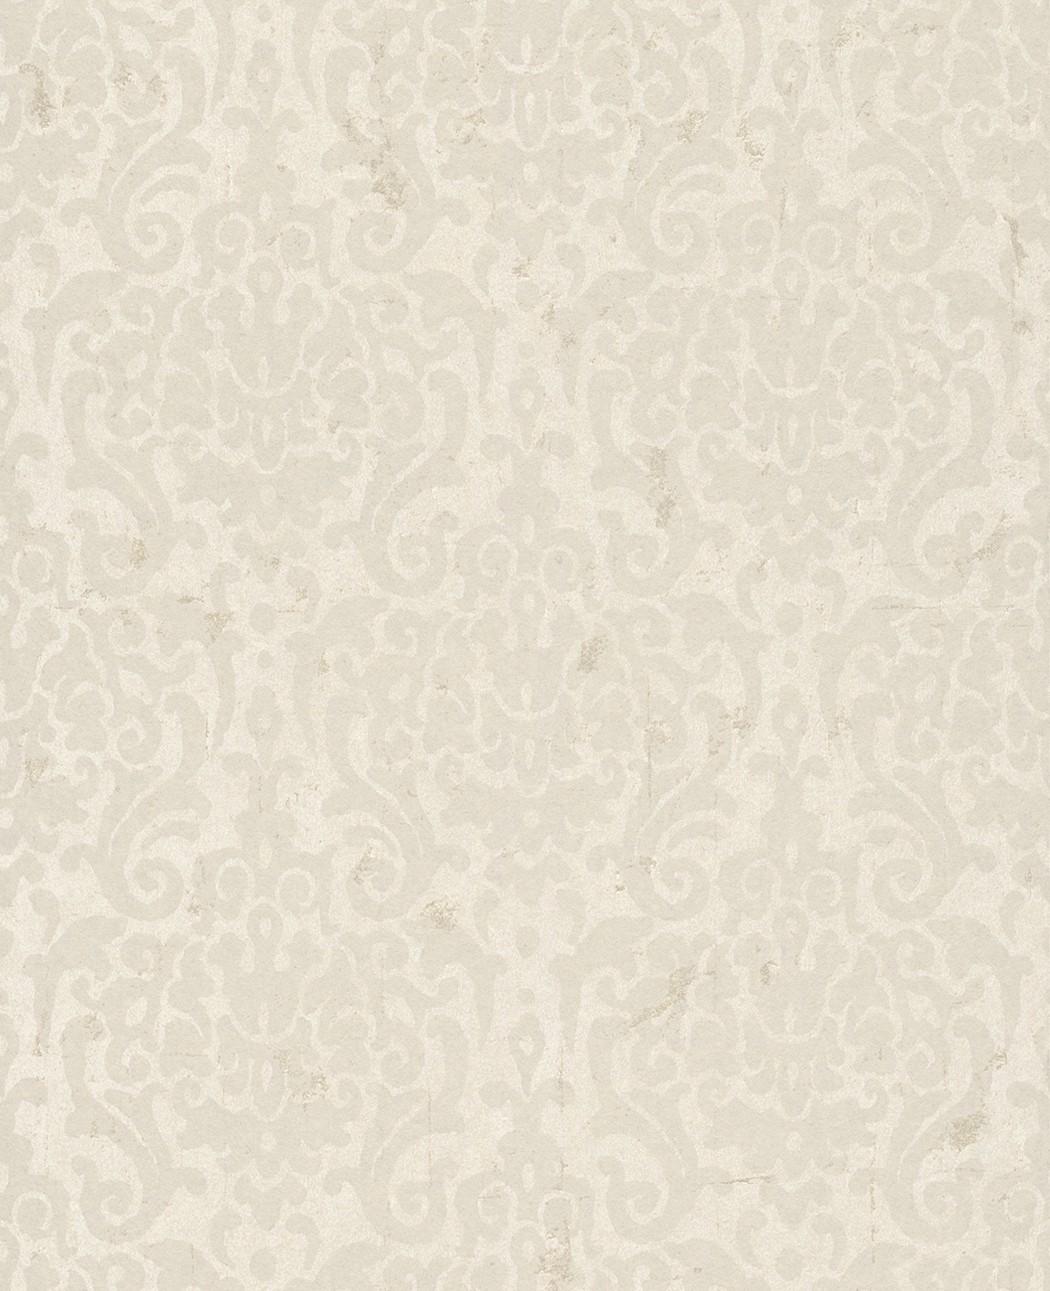 Textil Tapeten Eigenschaften : Tapete Rasch Textil Tintura Ornament creme 227443